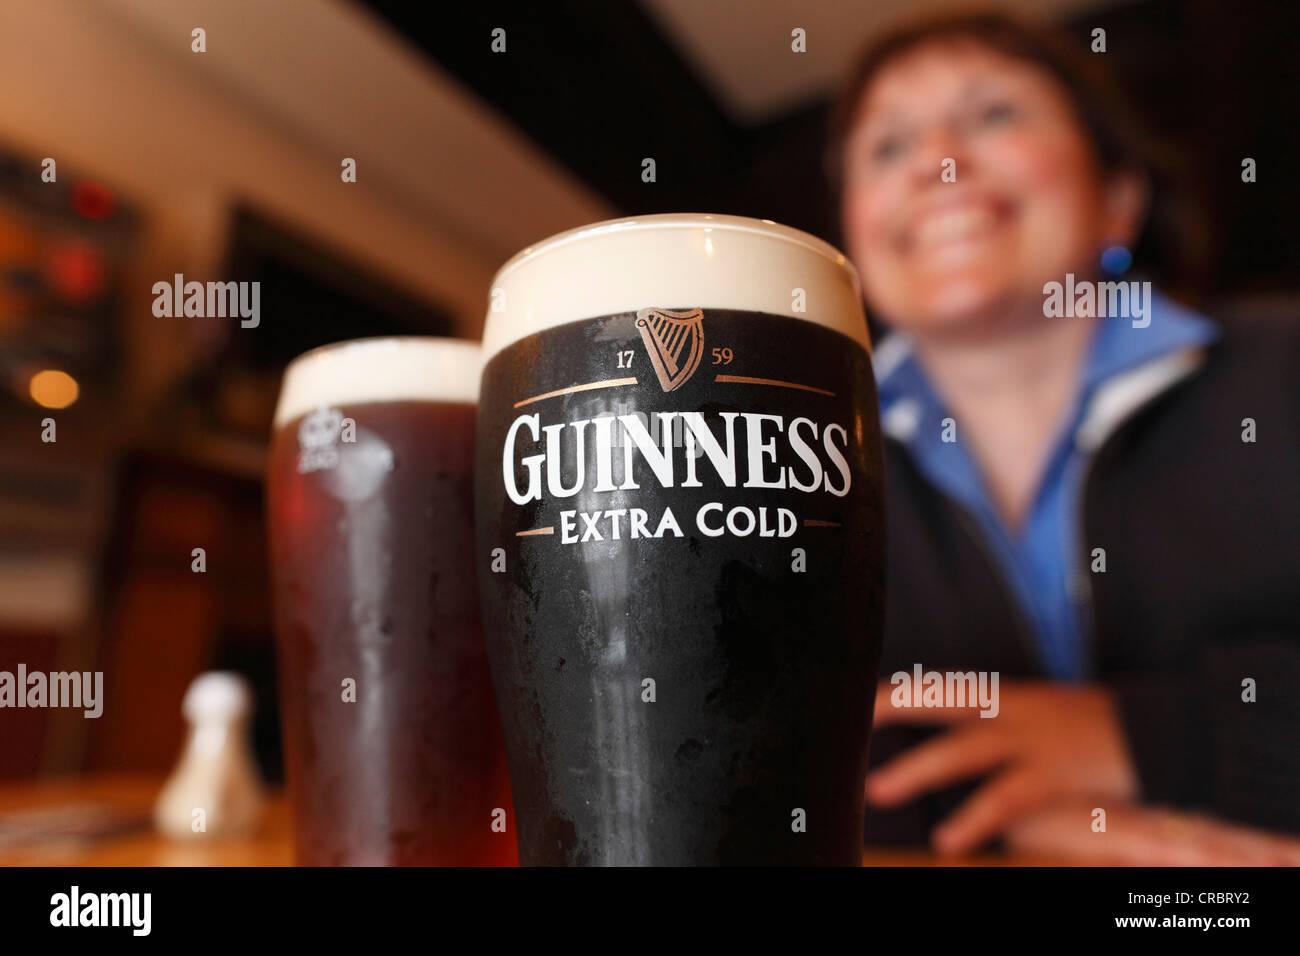 Pint of Guinness, stout beer, Mary McBride's Pub, Cushendun, County Antrim, Northern Ireland, United Kingdom, - Stock Image